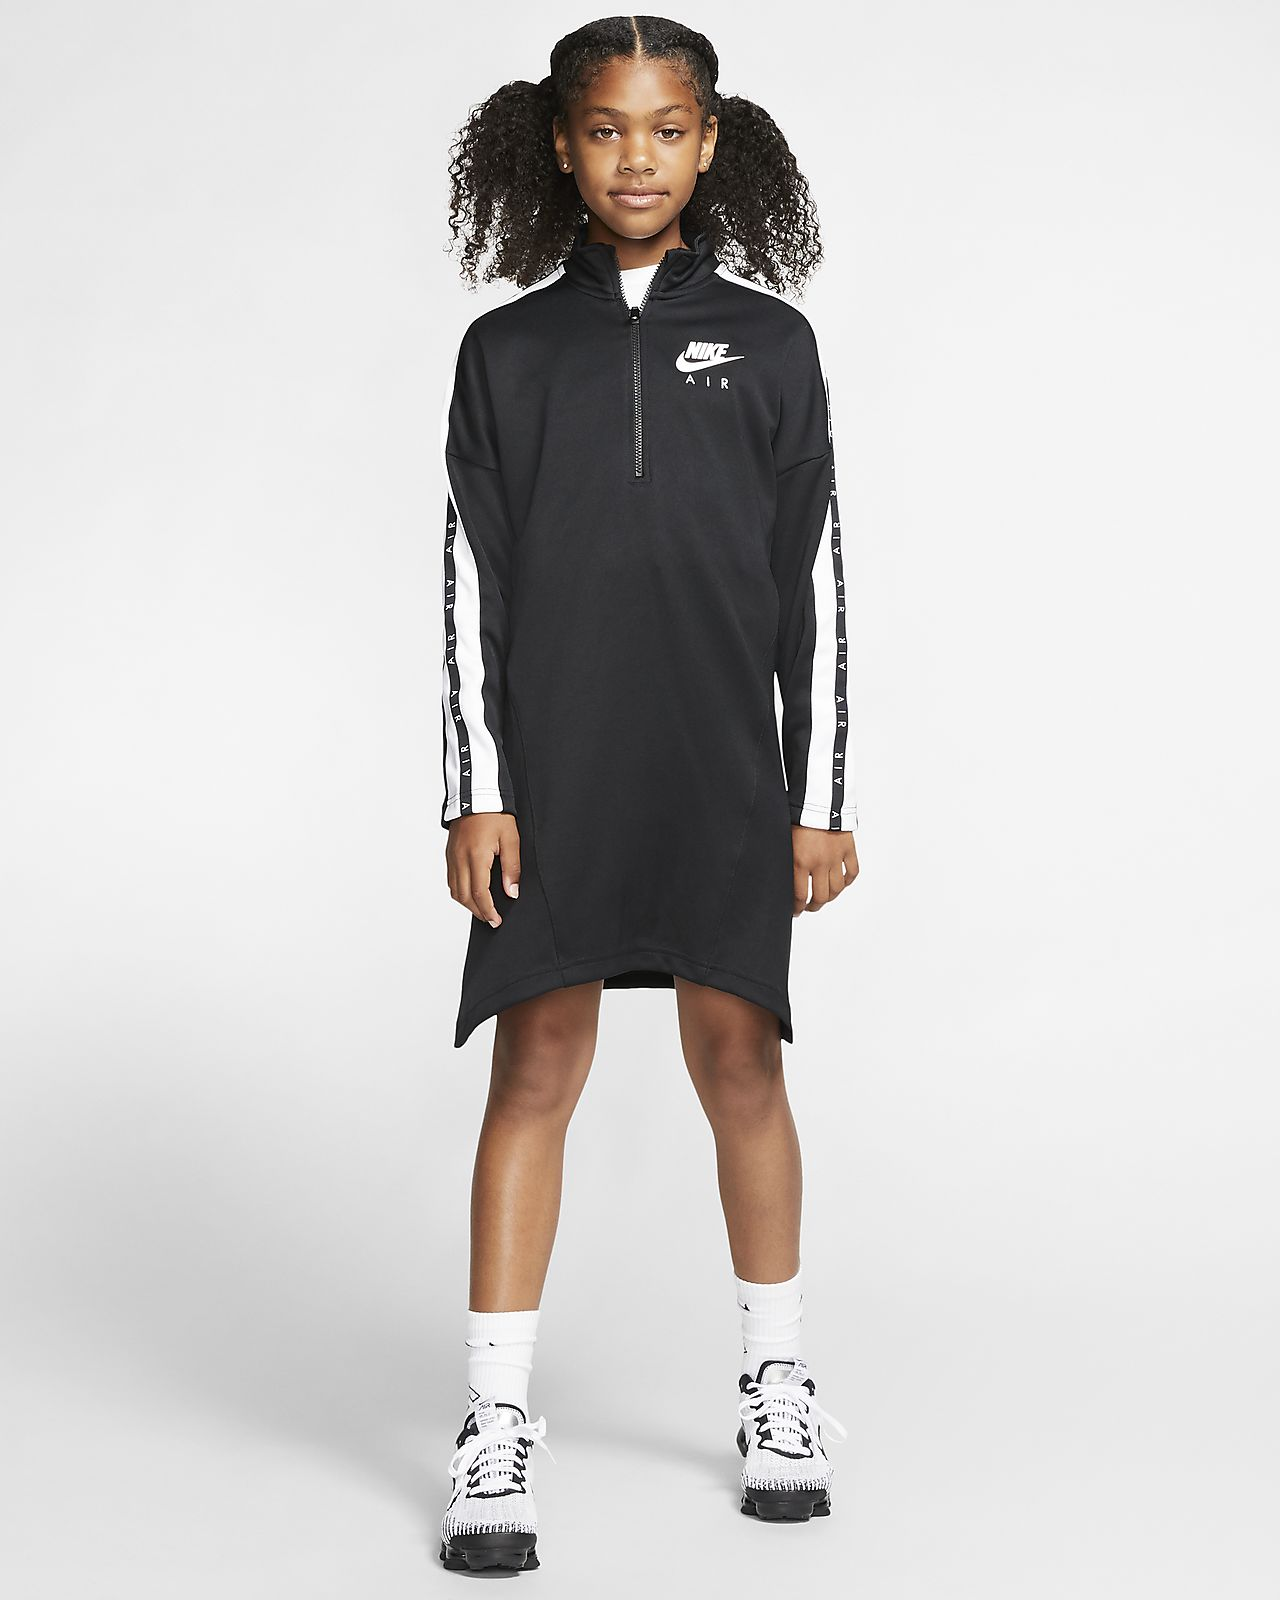 Robe Nike Air pour Fille plus âgée